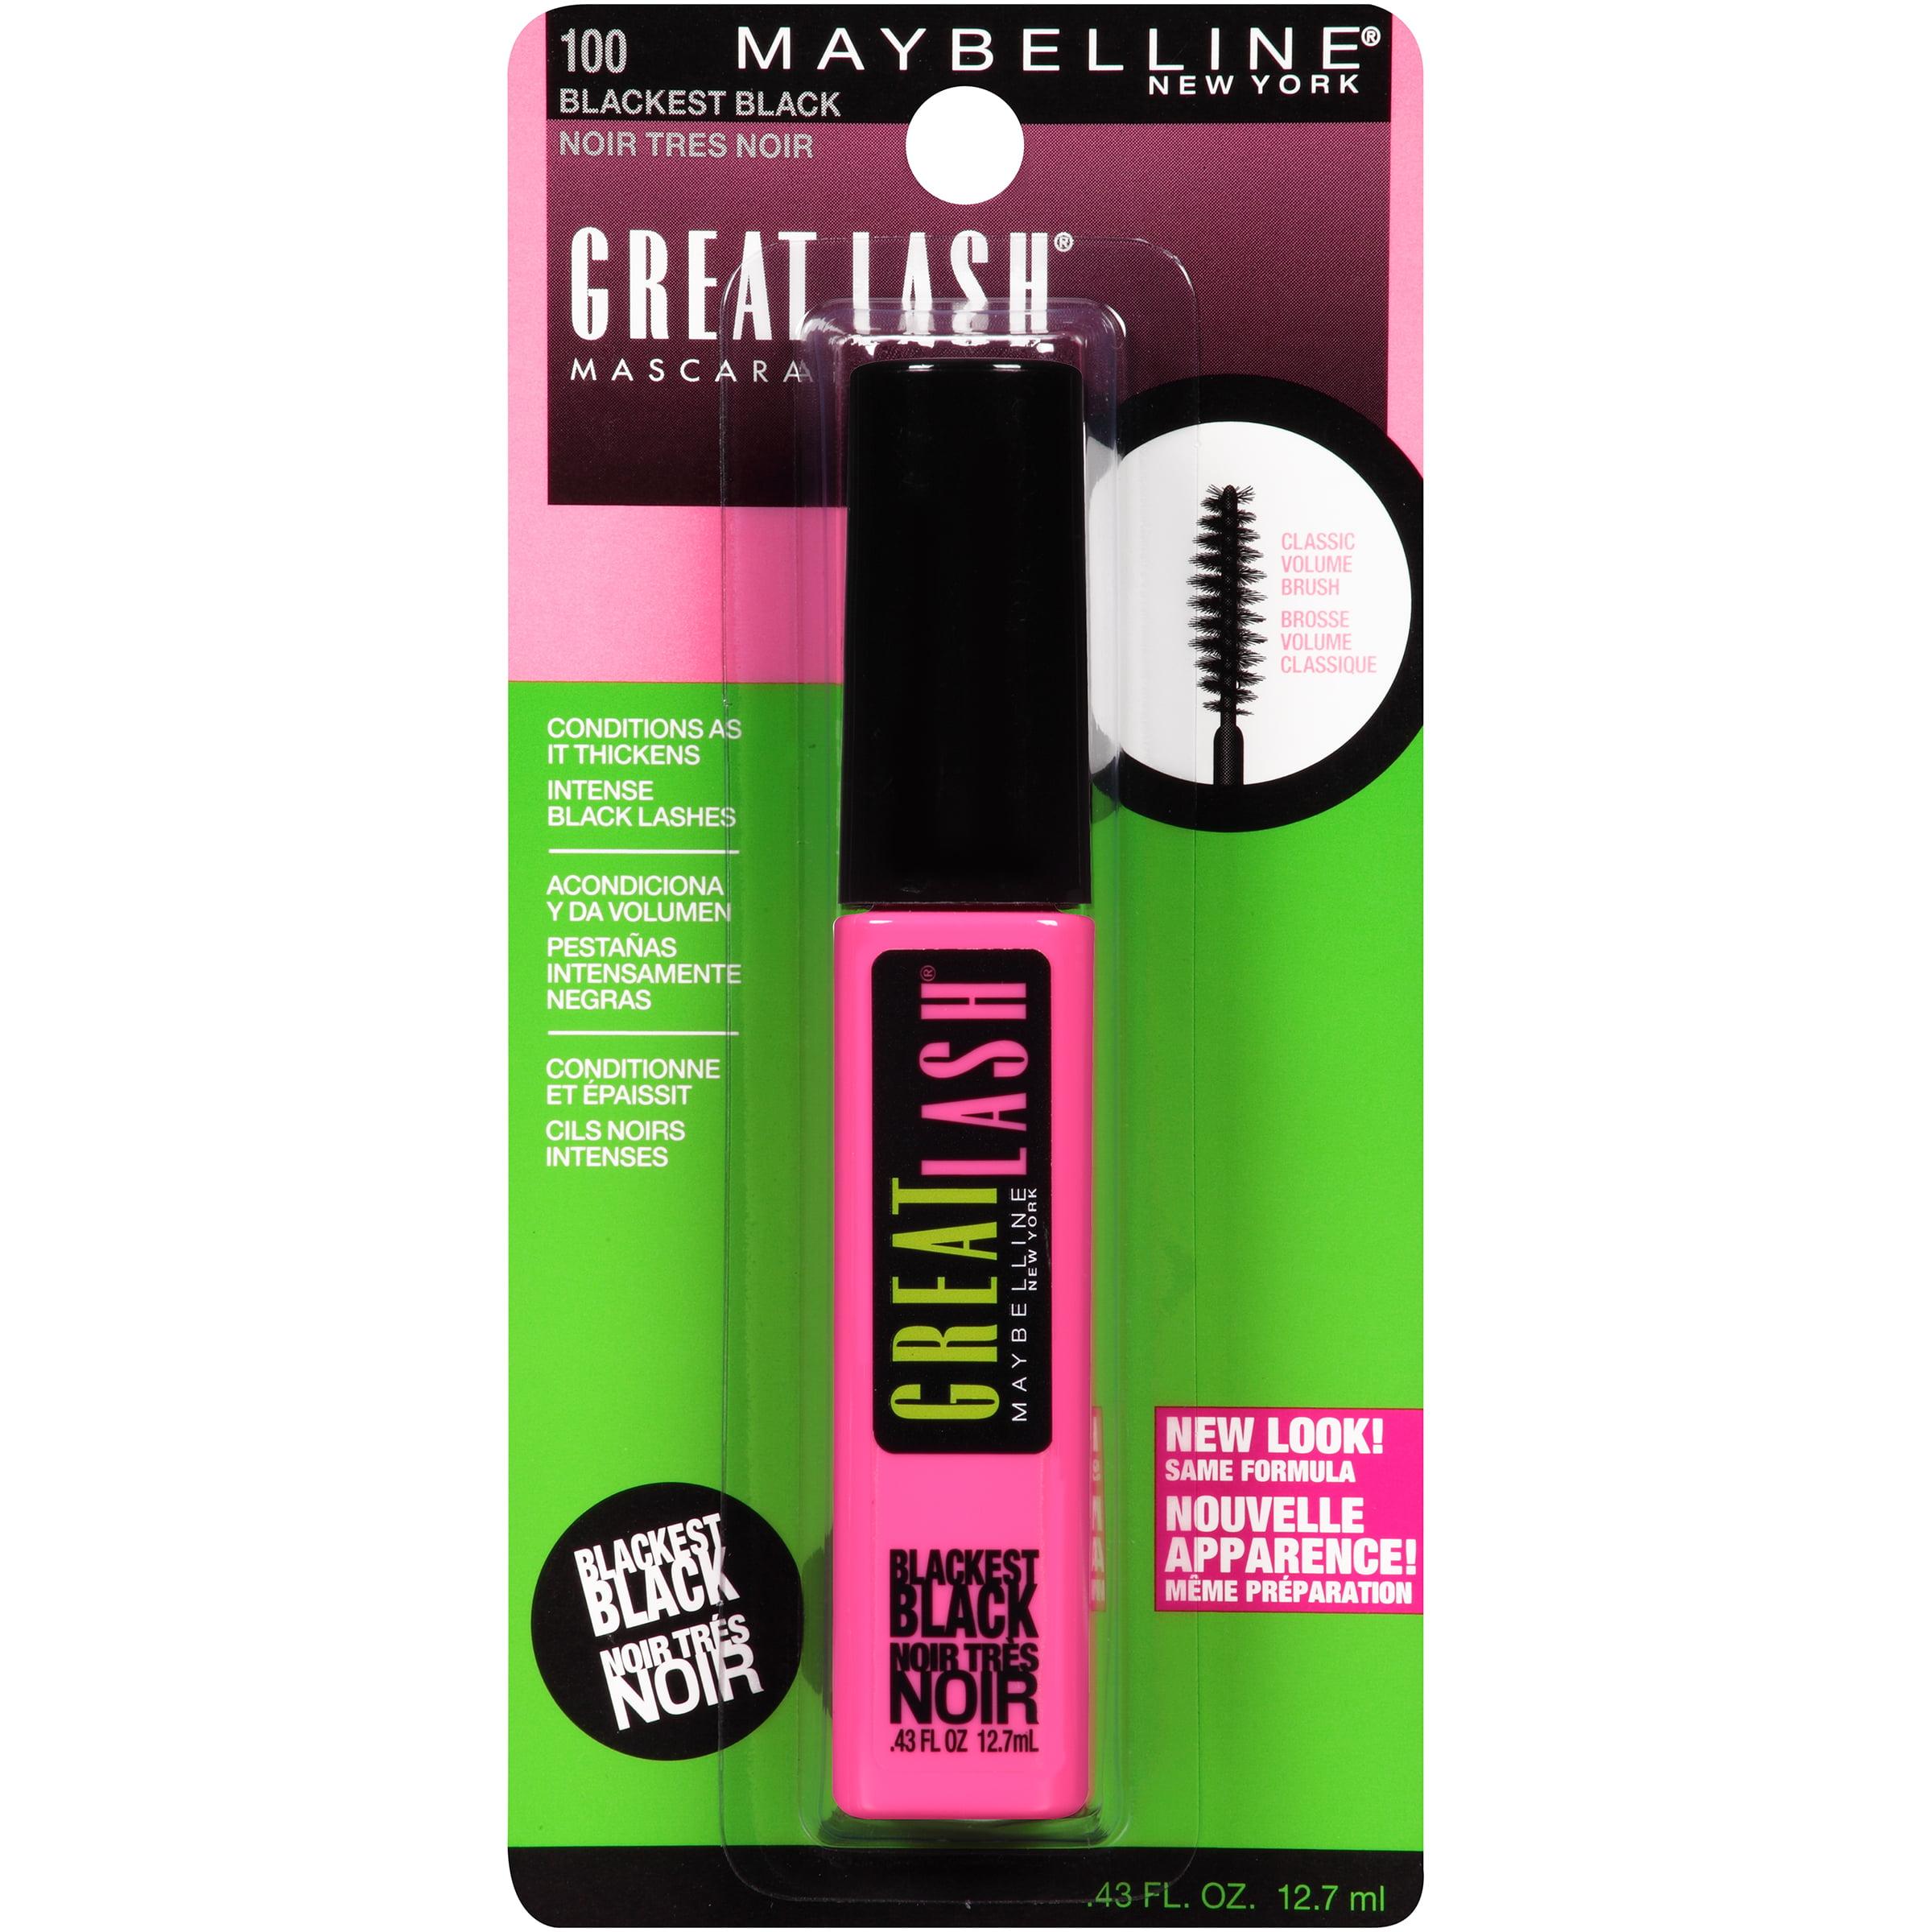 c422d6613e2 Maybelline New York Great Lash Washable Mascara, Blackest Black, .43 fl oz  - Walmart.com